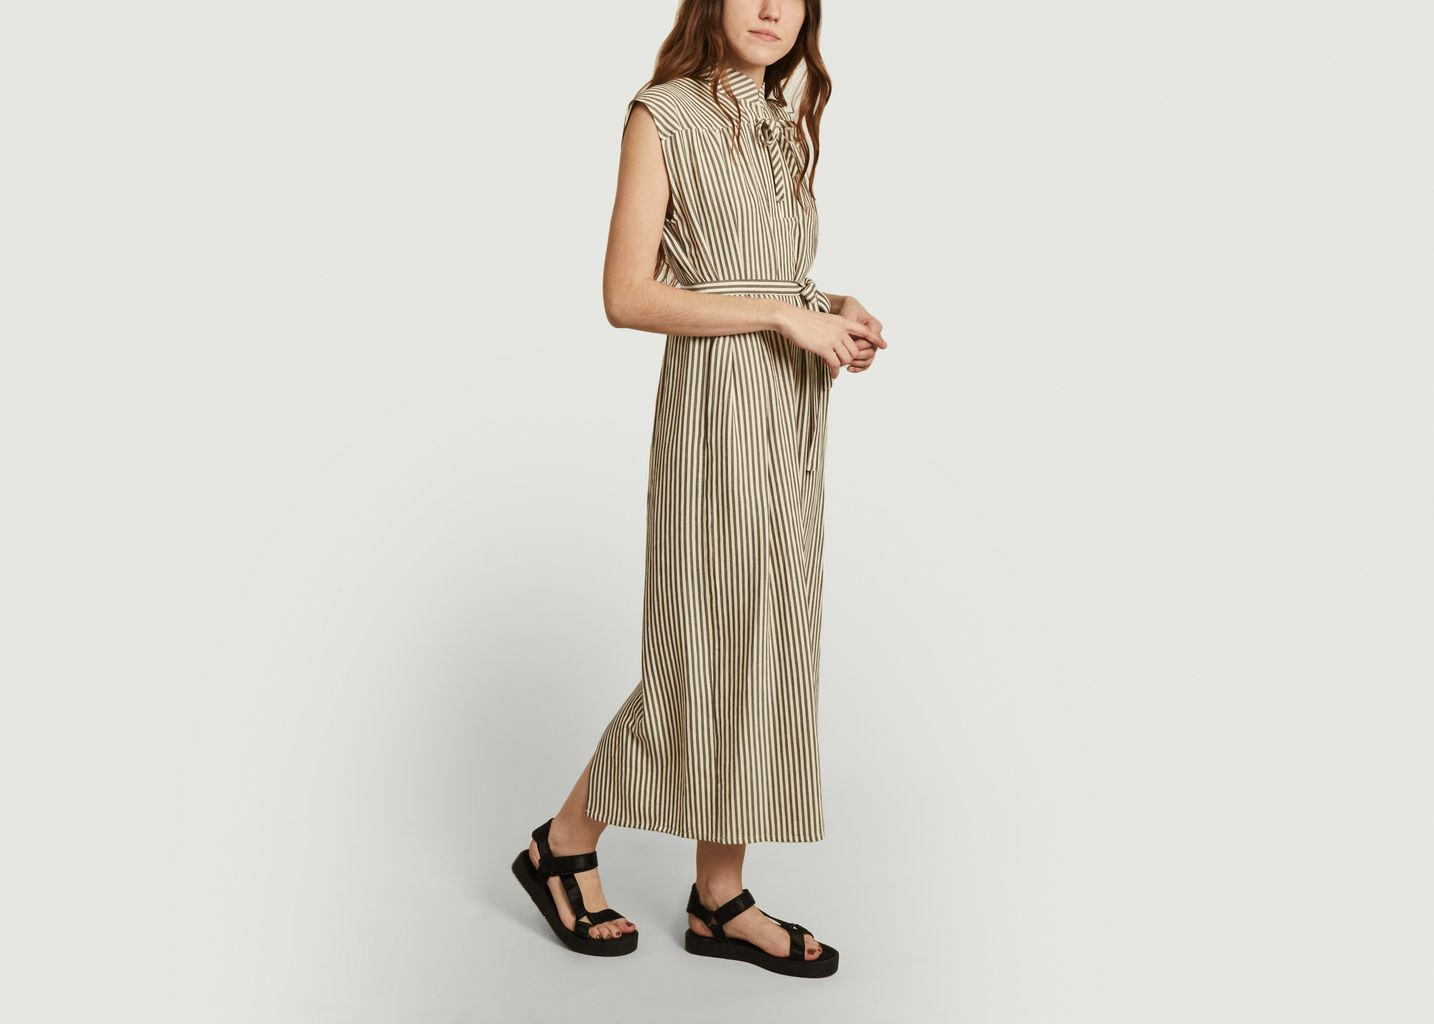 Robe Dreamer Melina à rayures  - Roseanna